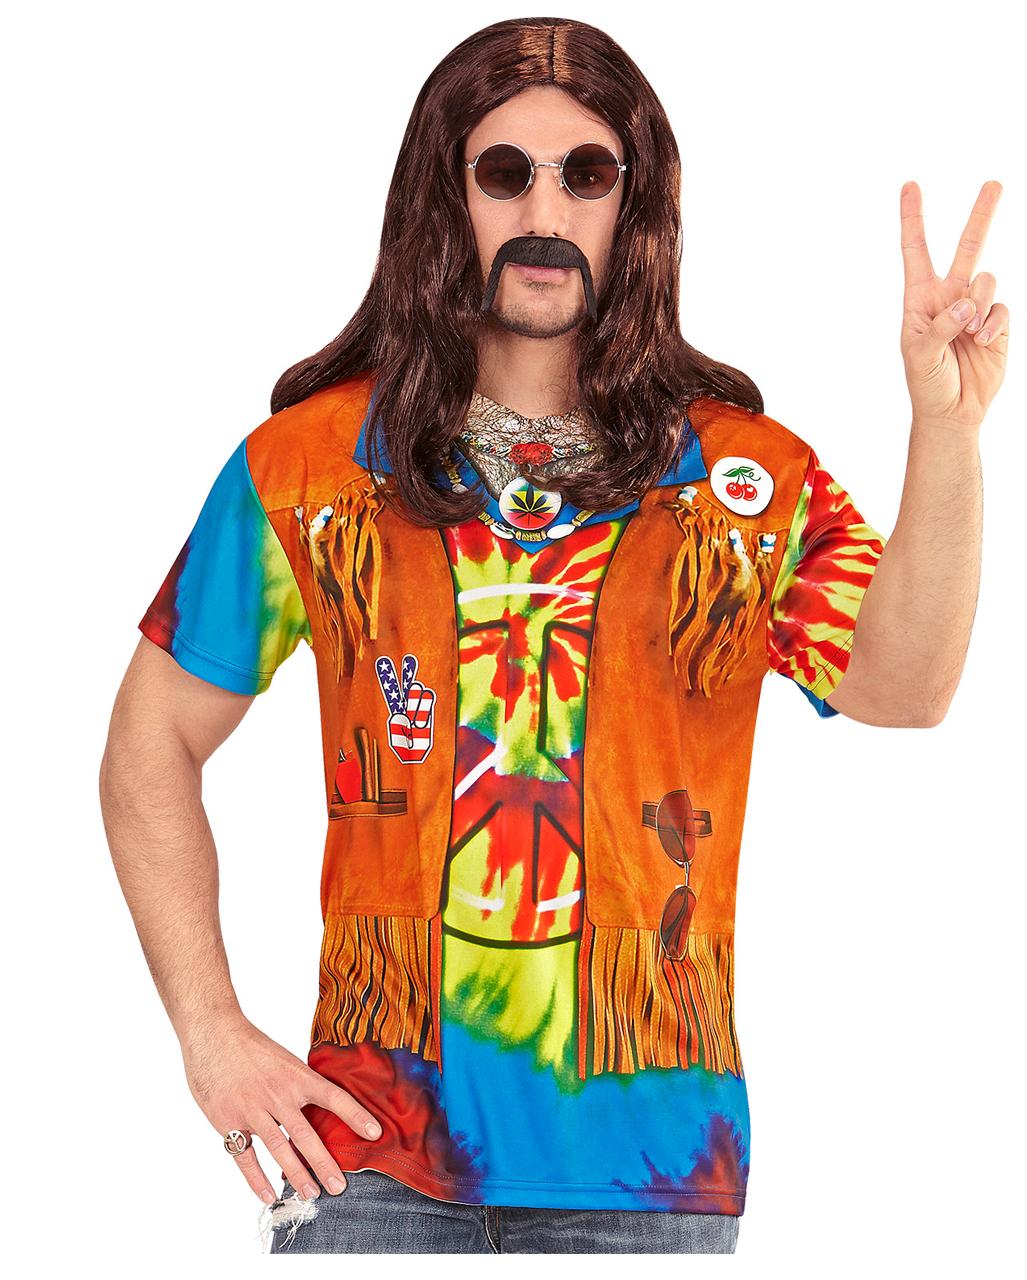 hippie-shirt--hippie-kostuem--flower-power-kostuem--reaggae-shirt--29395-1.jpg